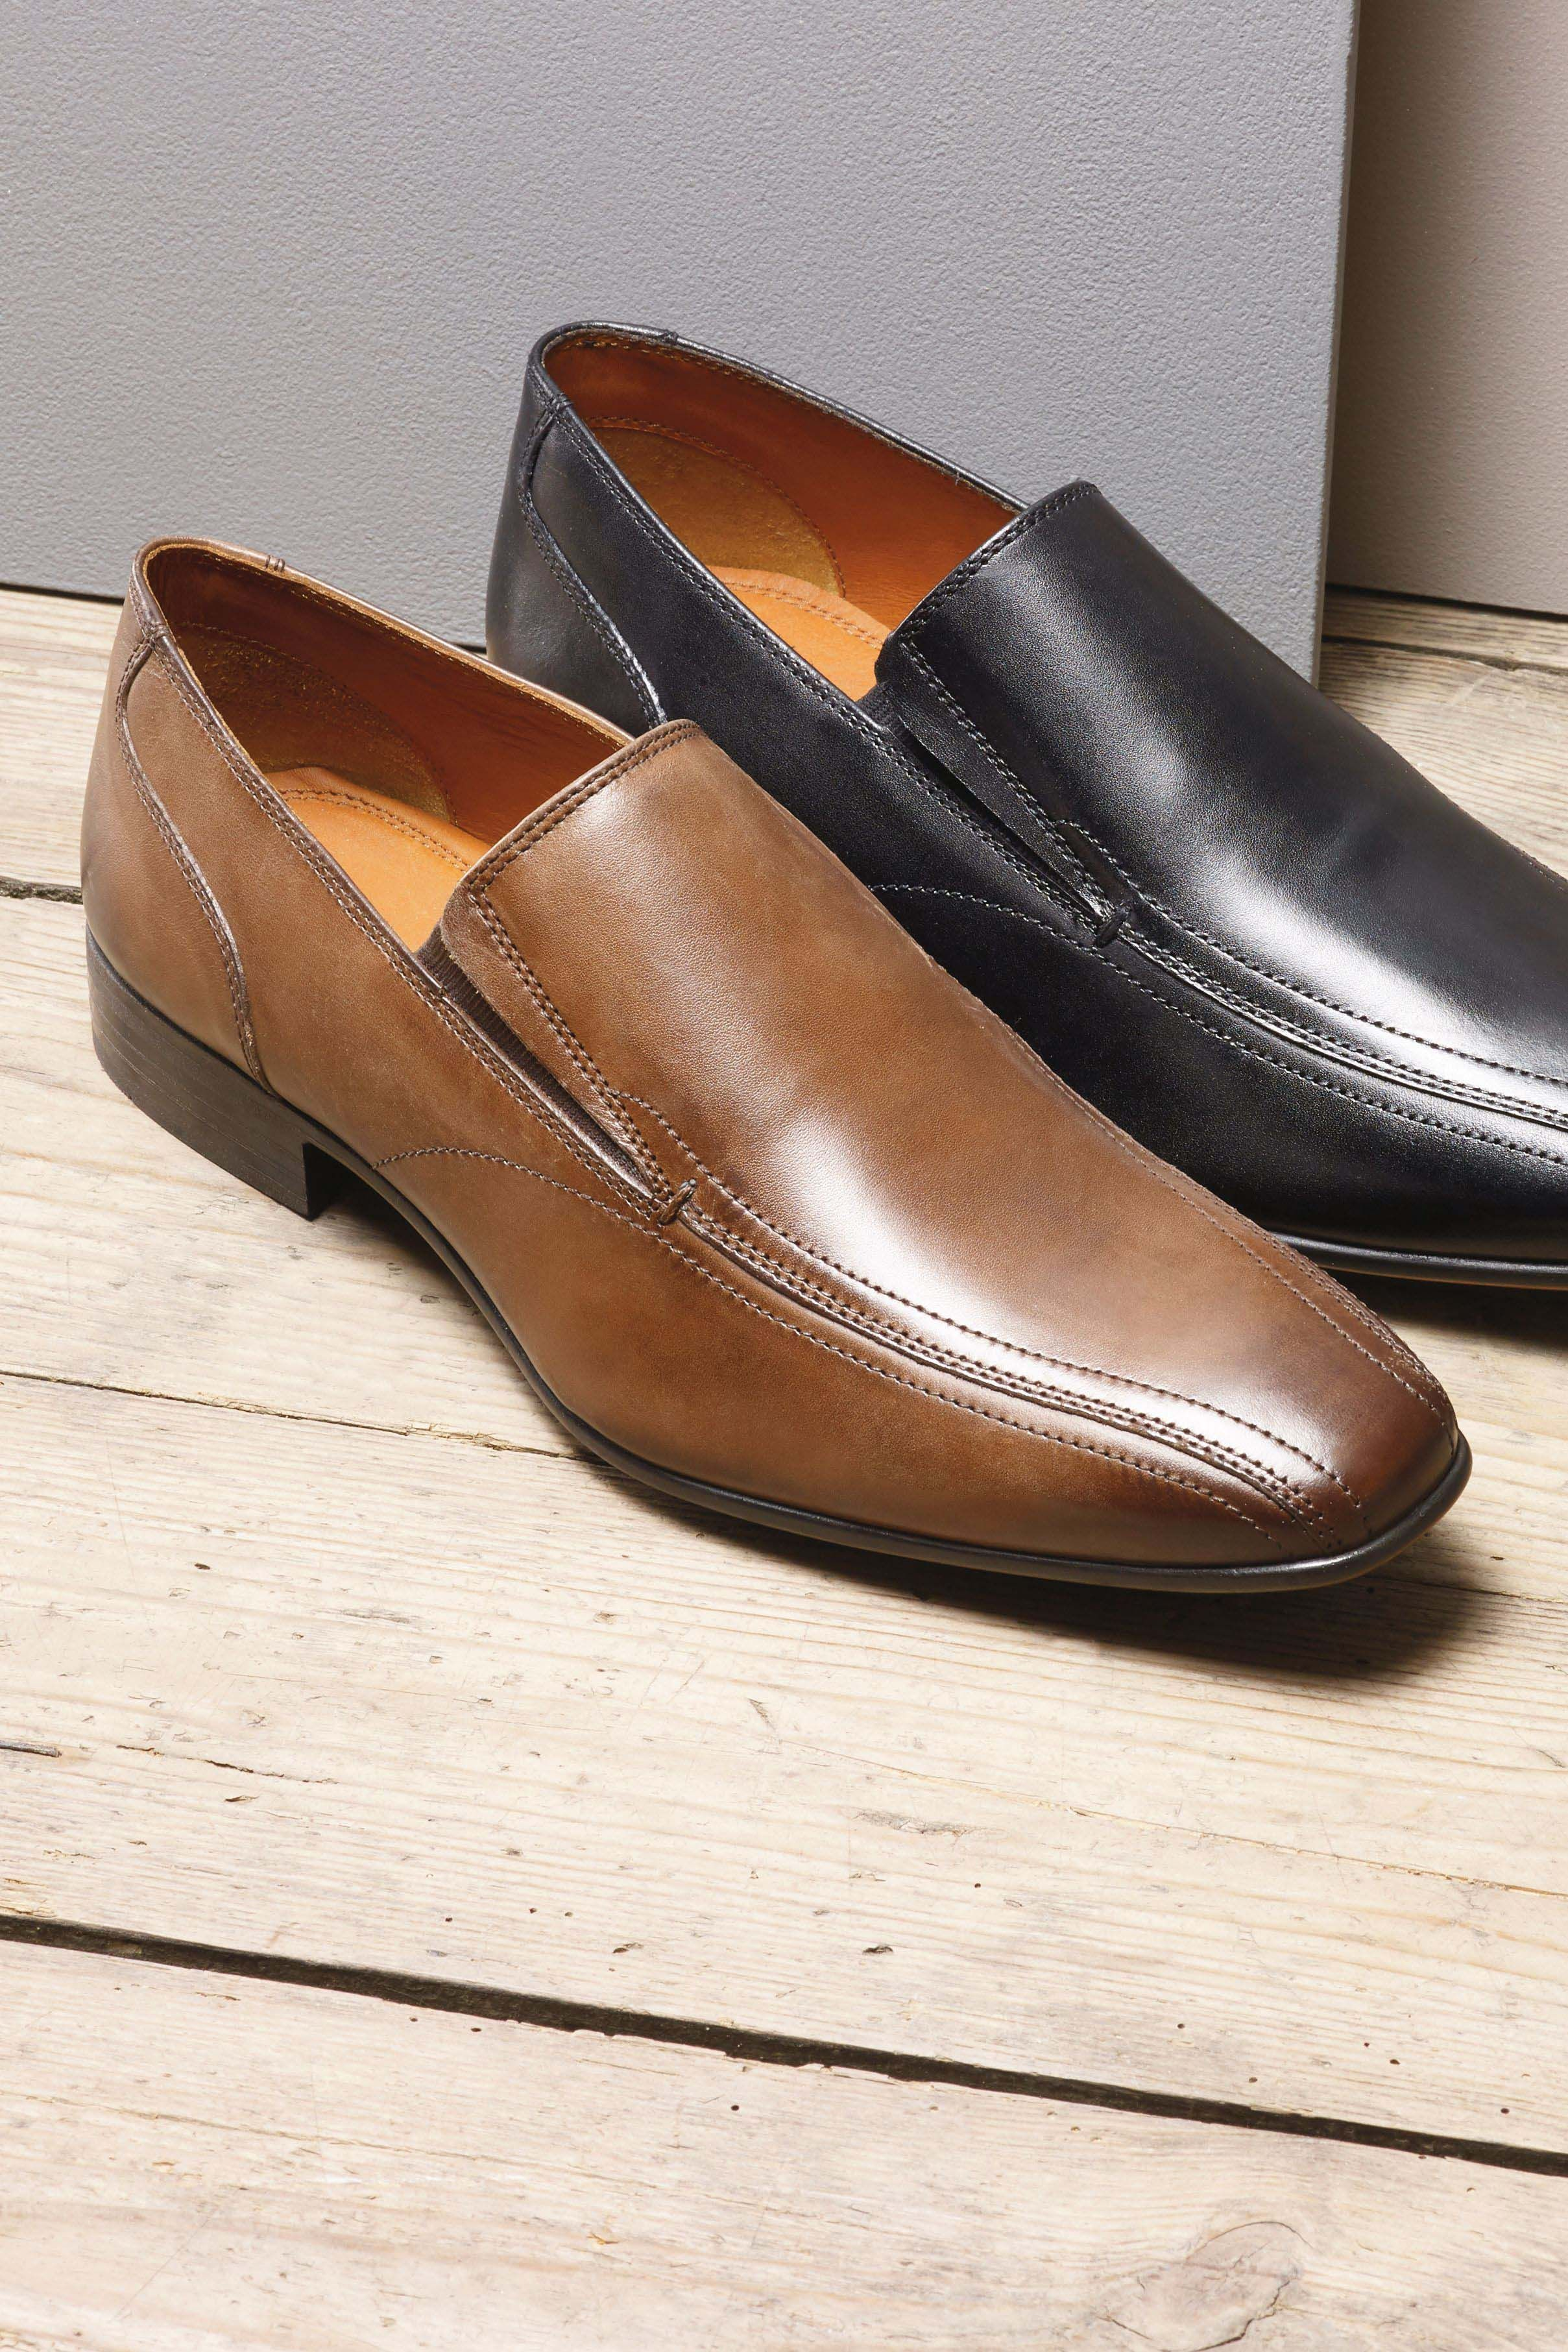 Brown slip on shoes, Shoes, Dress shoes men